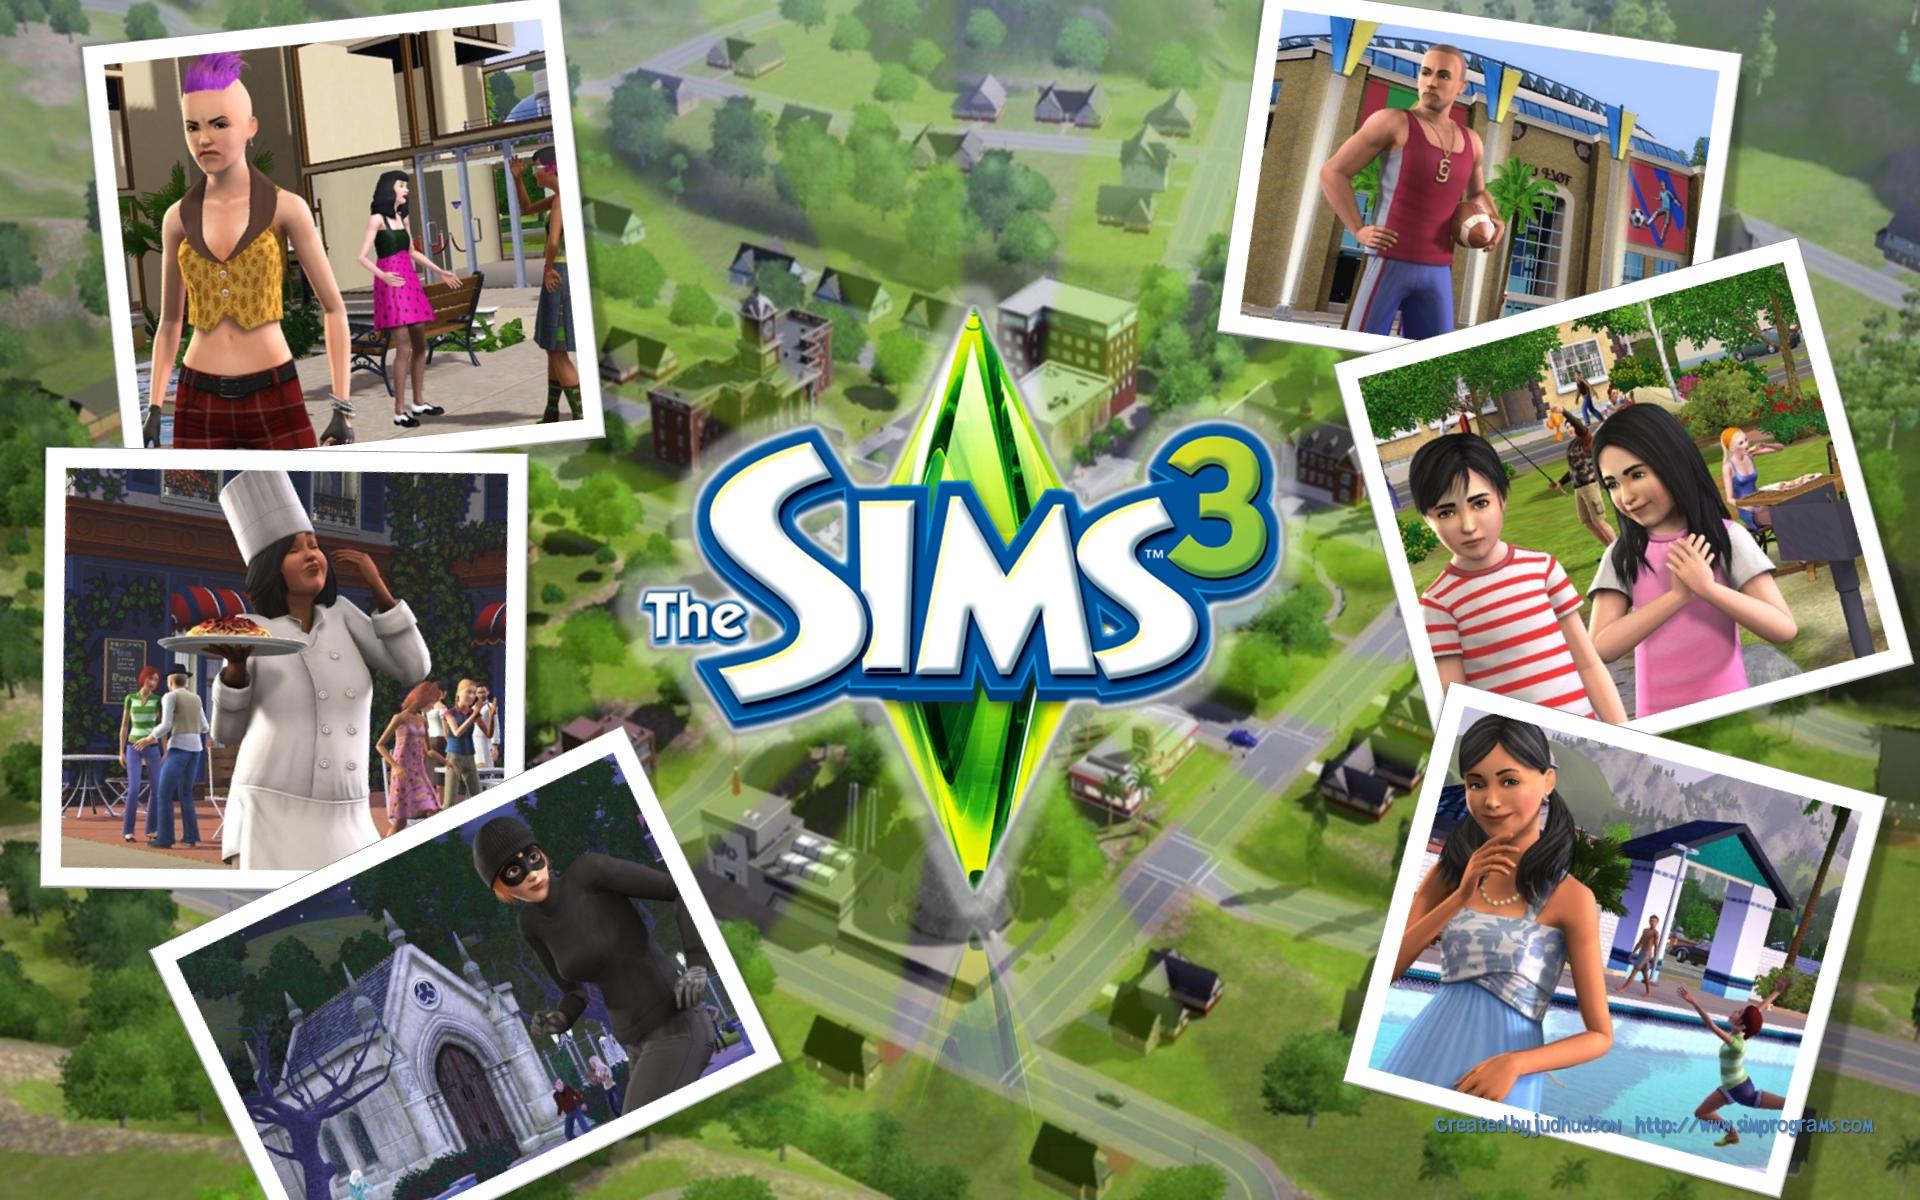 The Sims 3 Wallpapers the sims 3 wallpaper hd Wallpapereorg 1920x1200